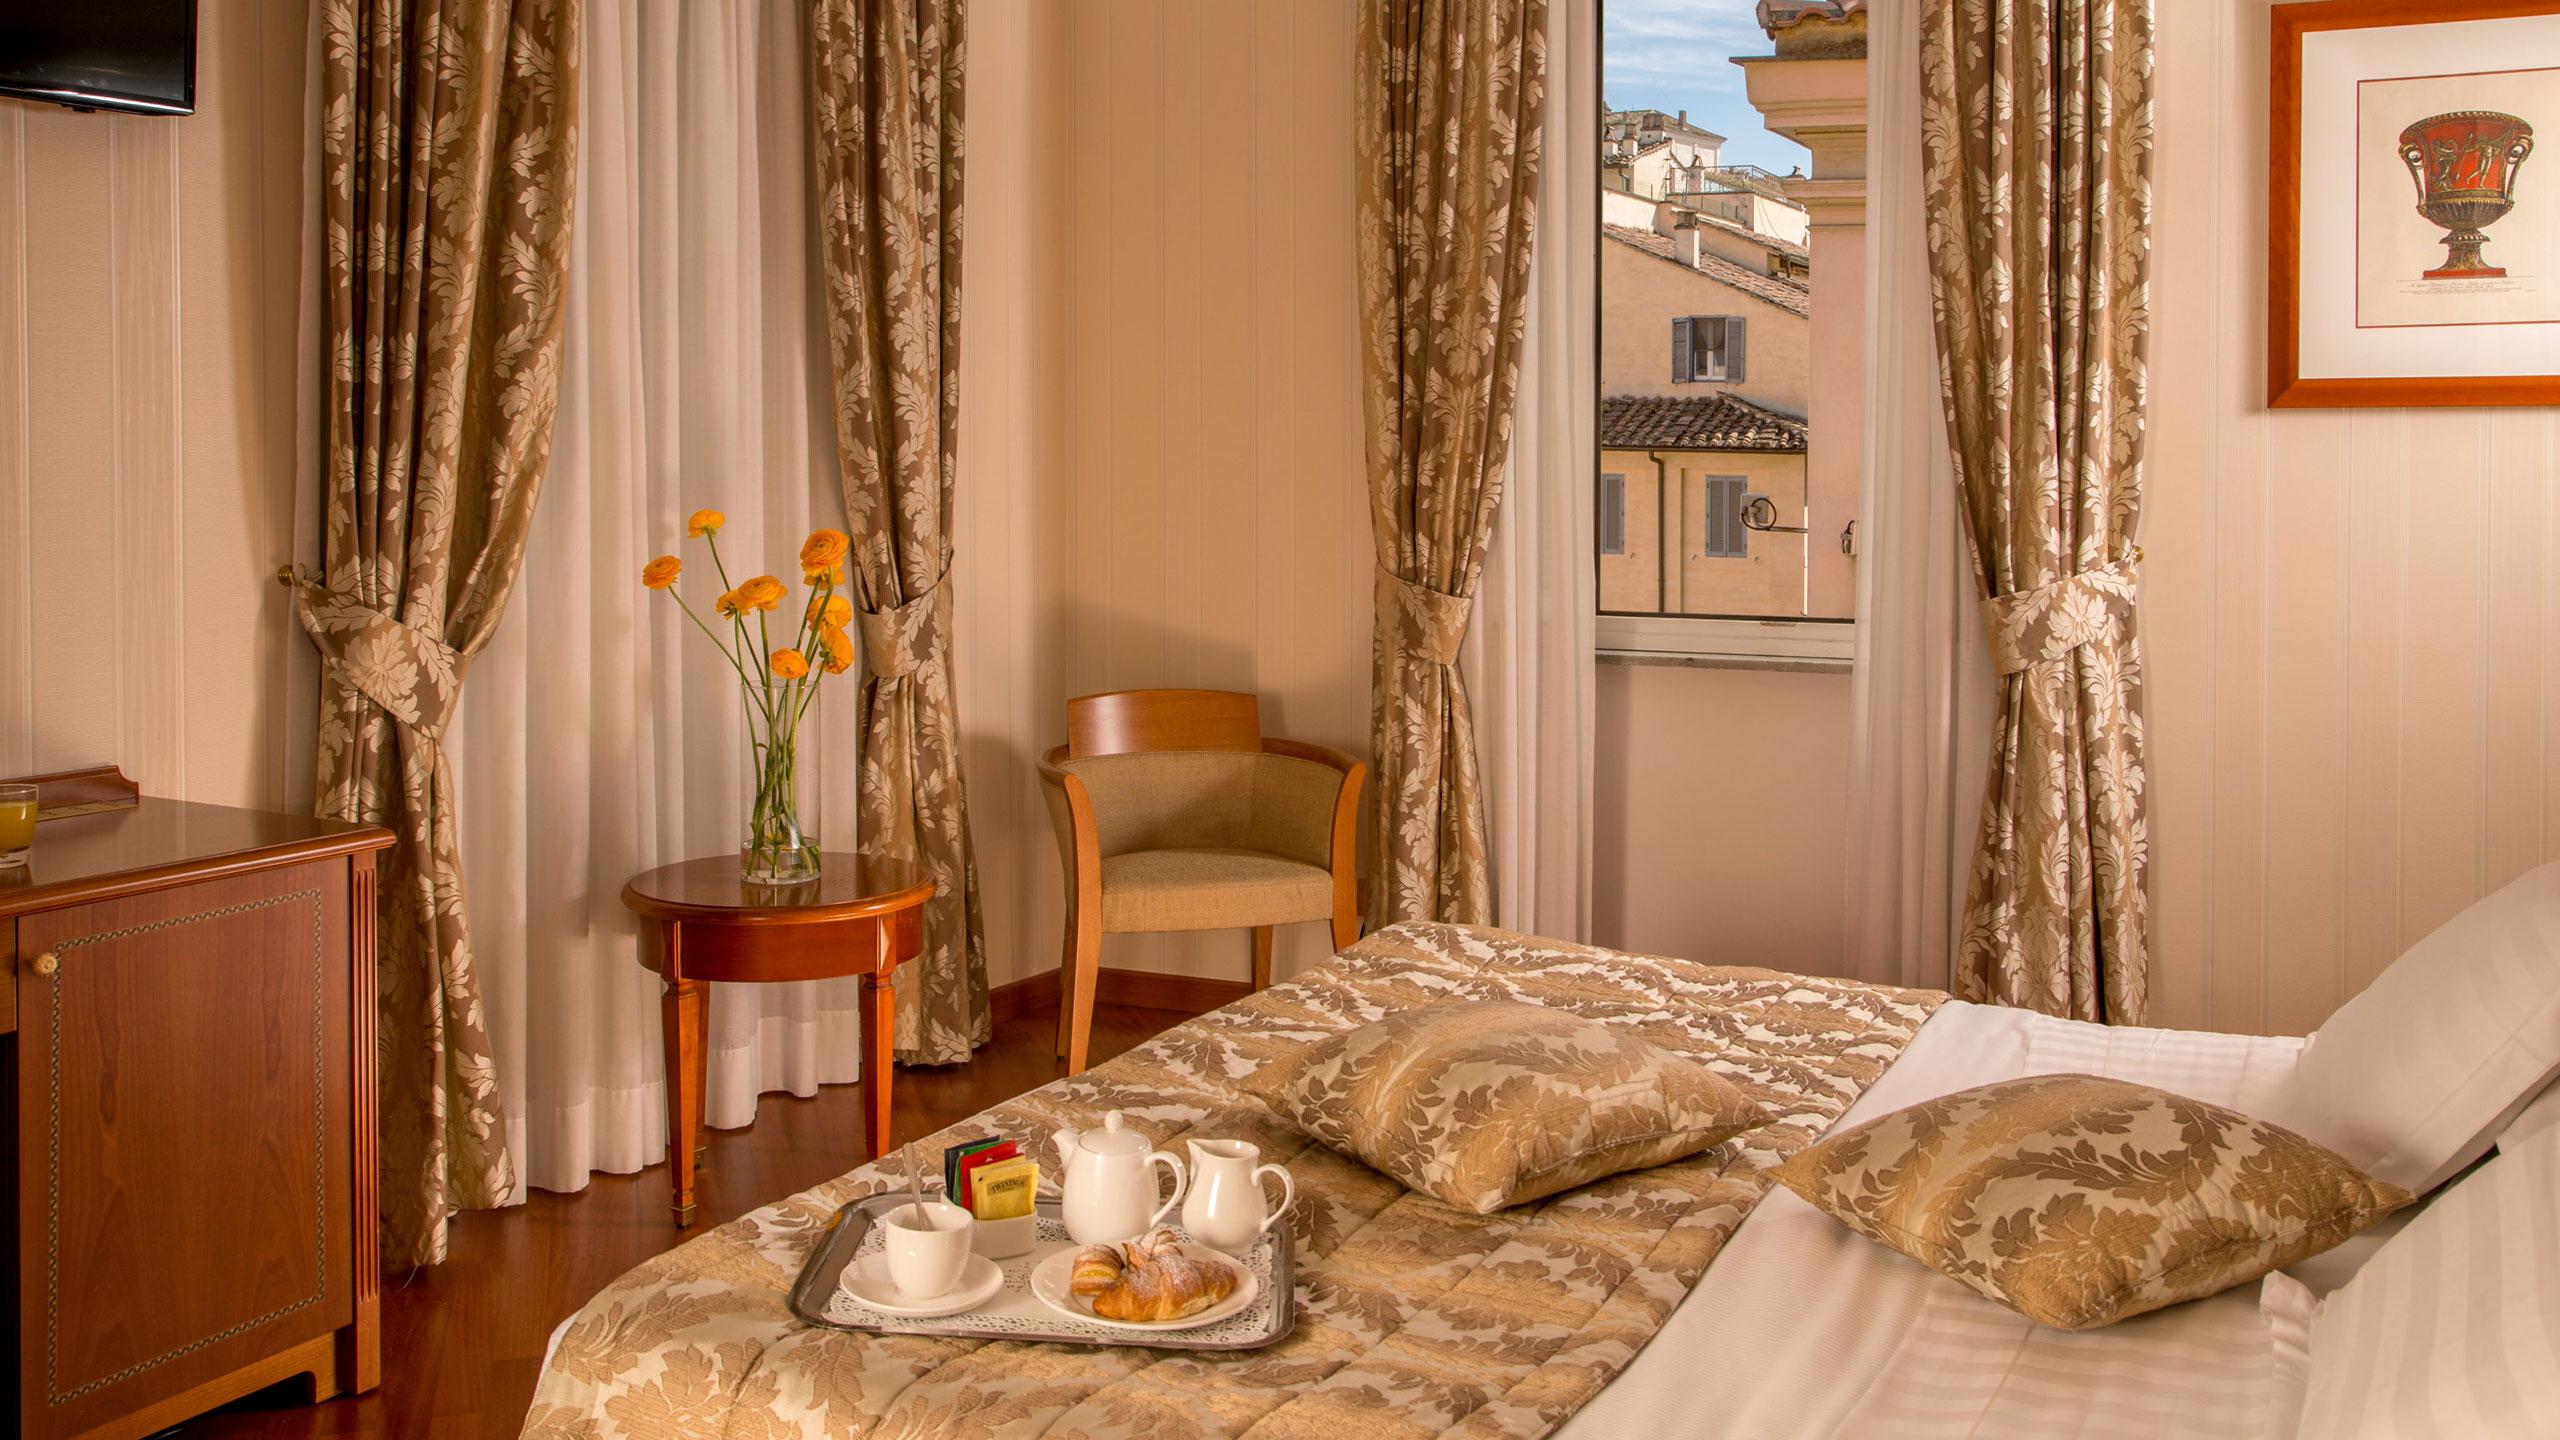 albergo-ottocento-rome-double-room-deluxe-07